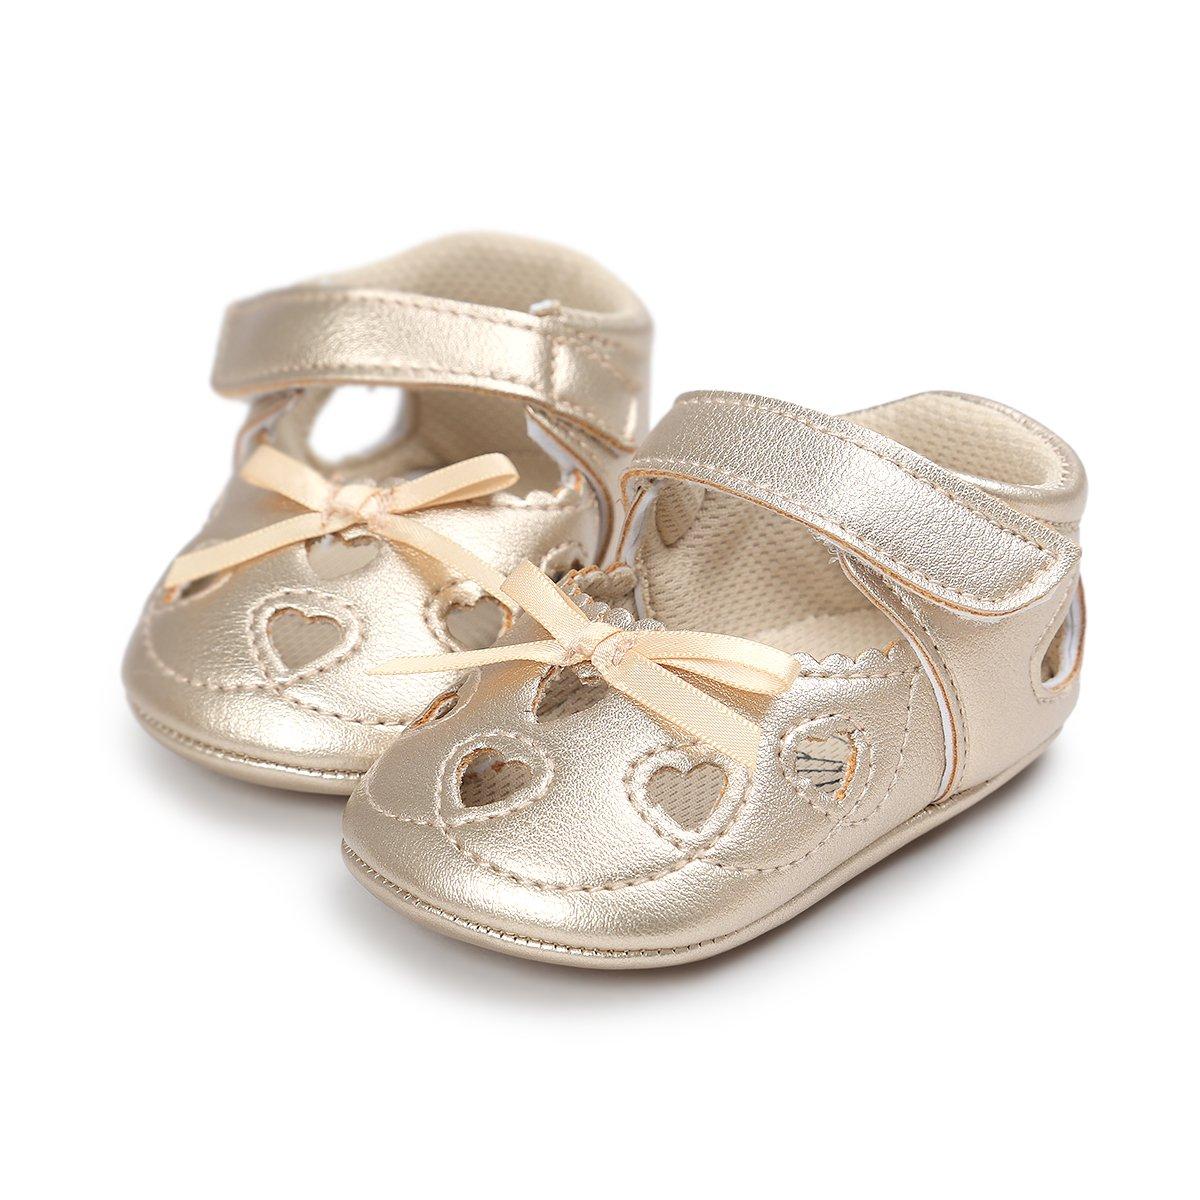 Meckior Infant Baby Girls Sandas Summer Soft Leather No-slip Princess Shoes (6-12months, A-gold)